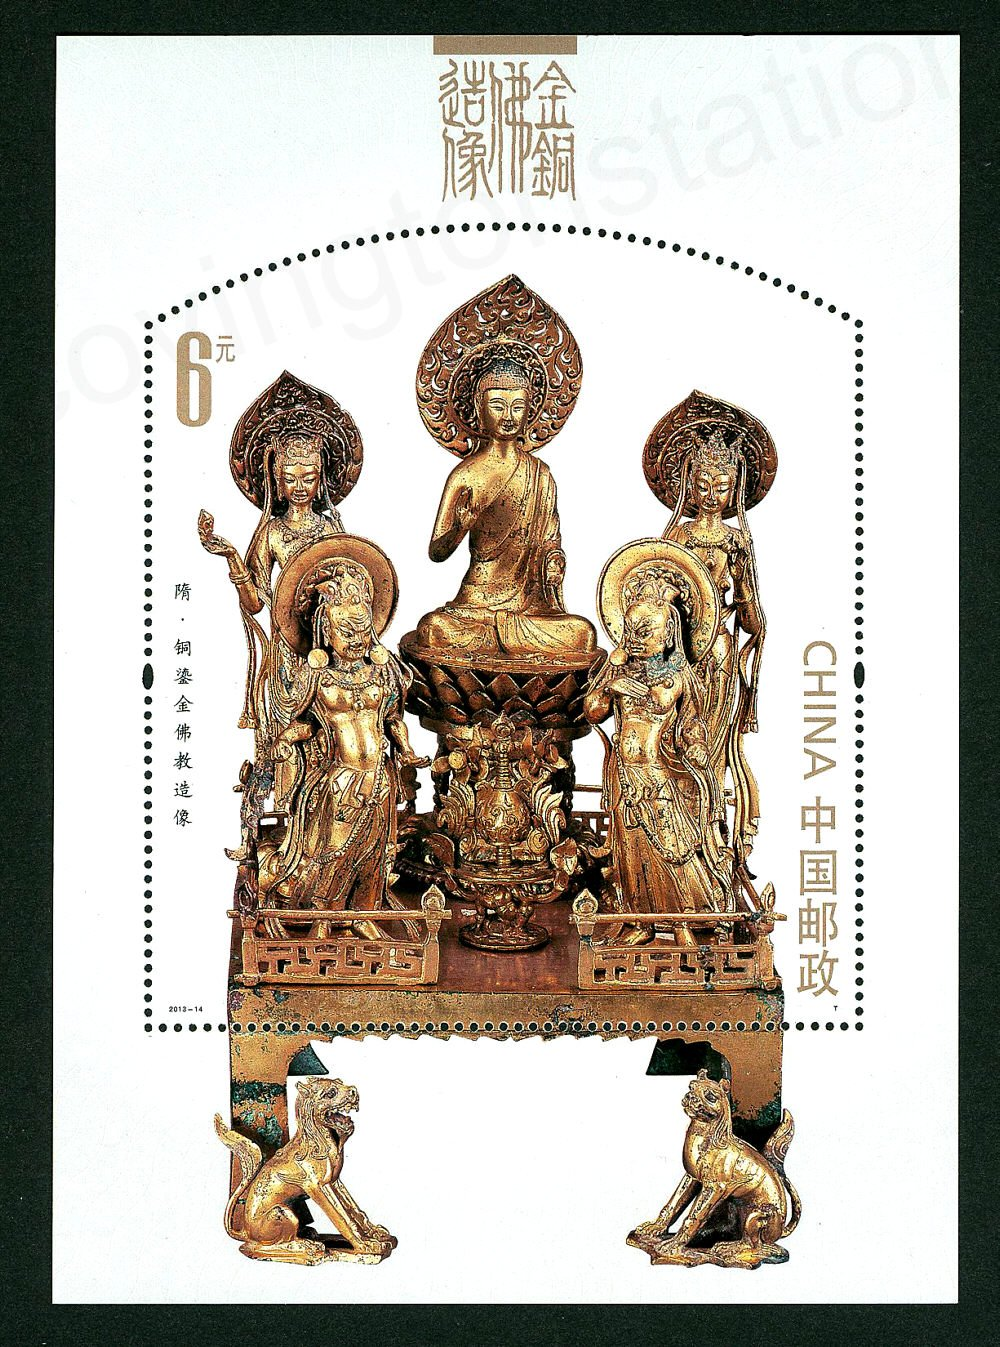 China Gold/Bronze Buddhas souvenir sheet mnh 2013 new issue